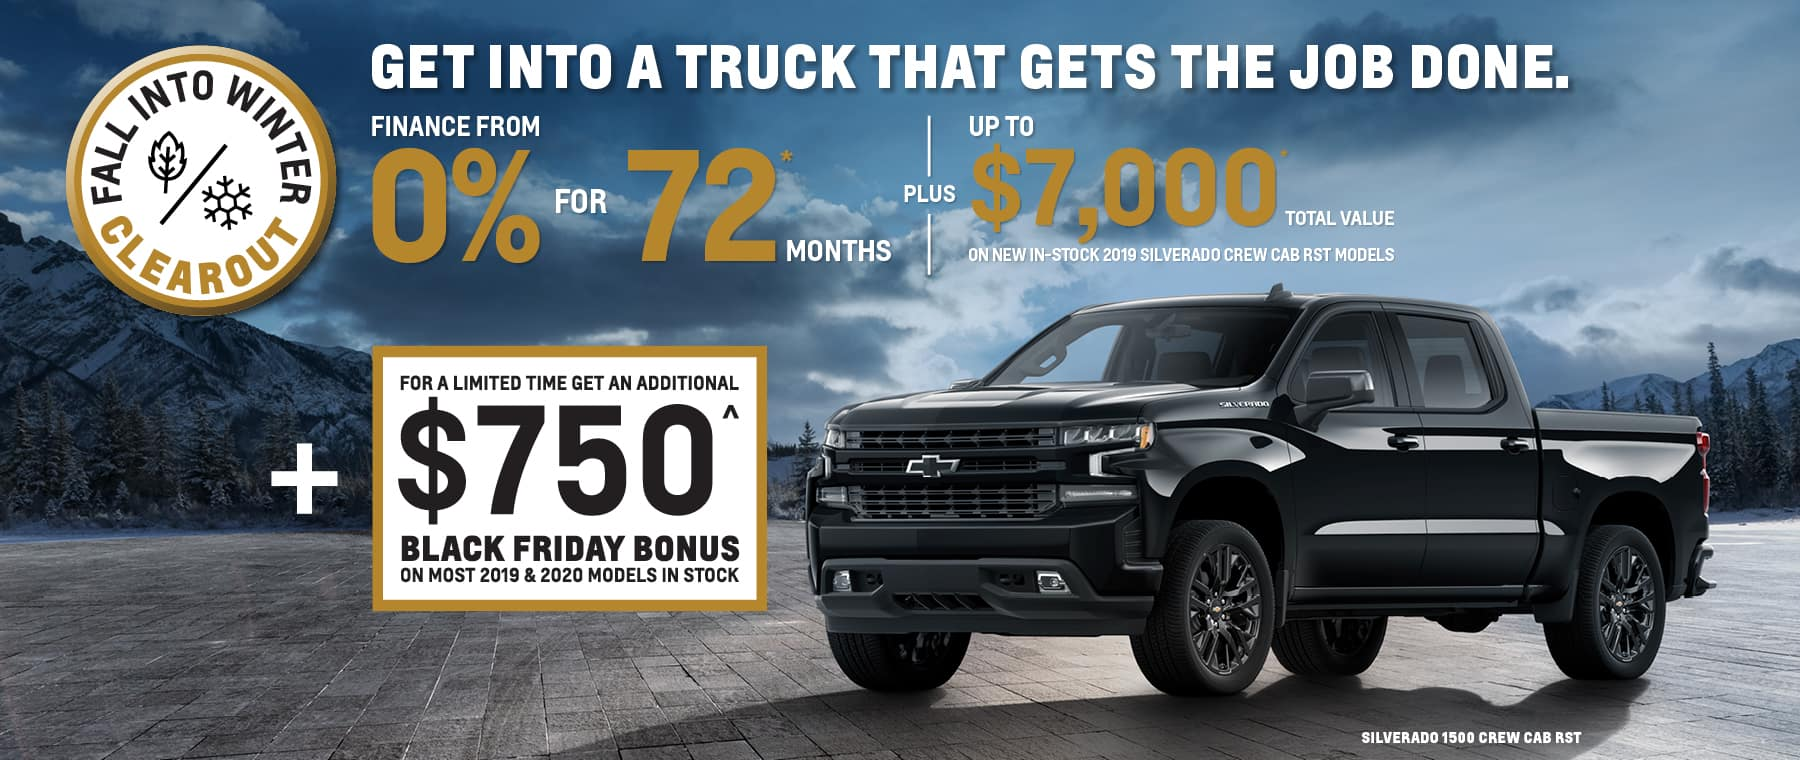 Black Friday Bonus Chevrolet Truck